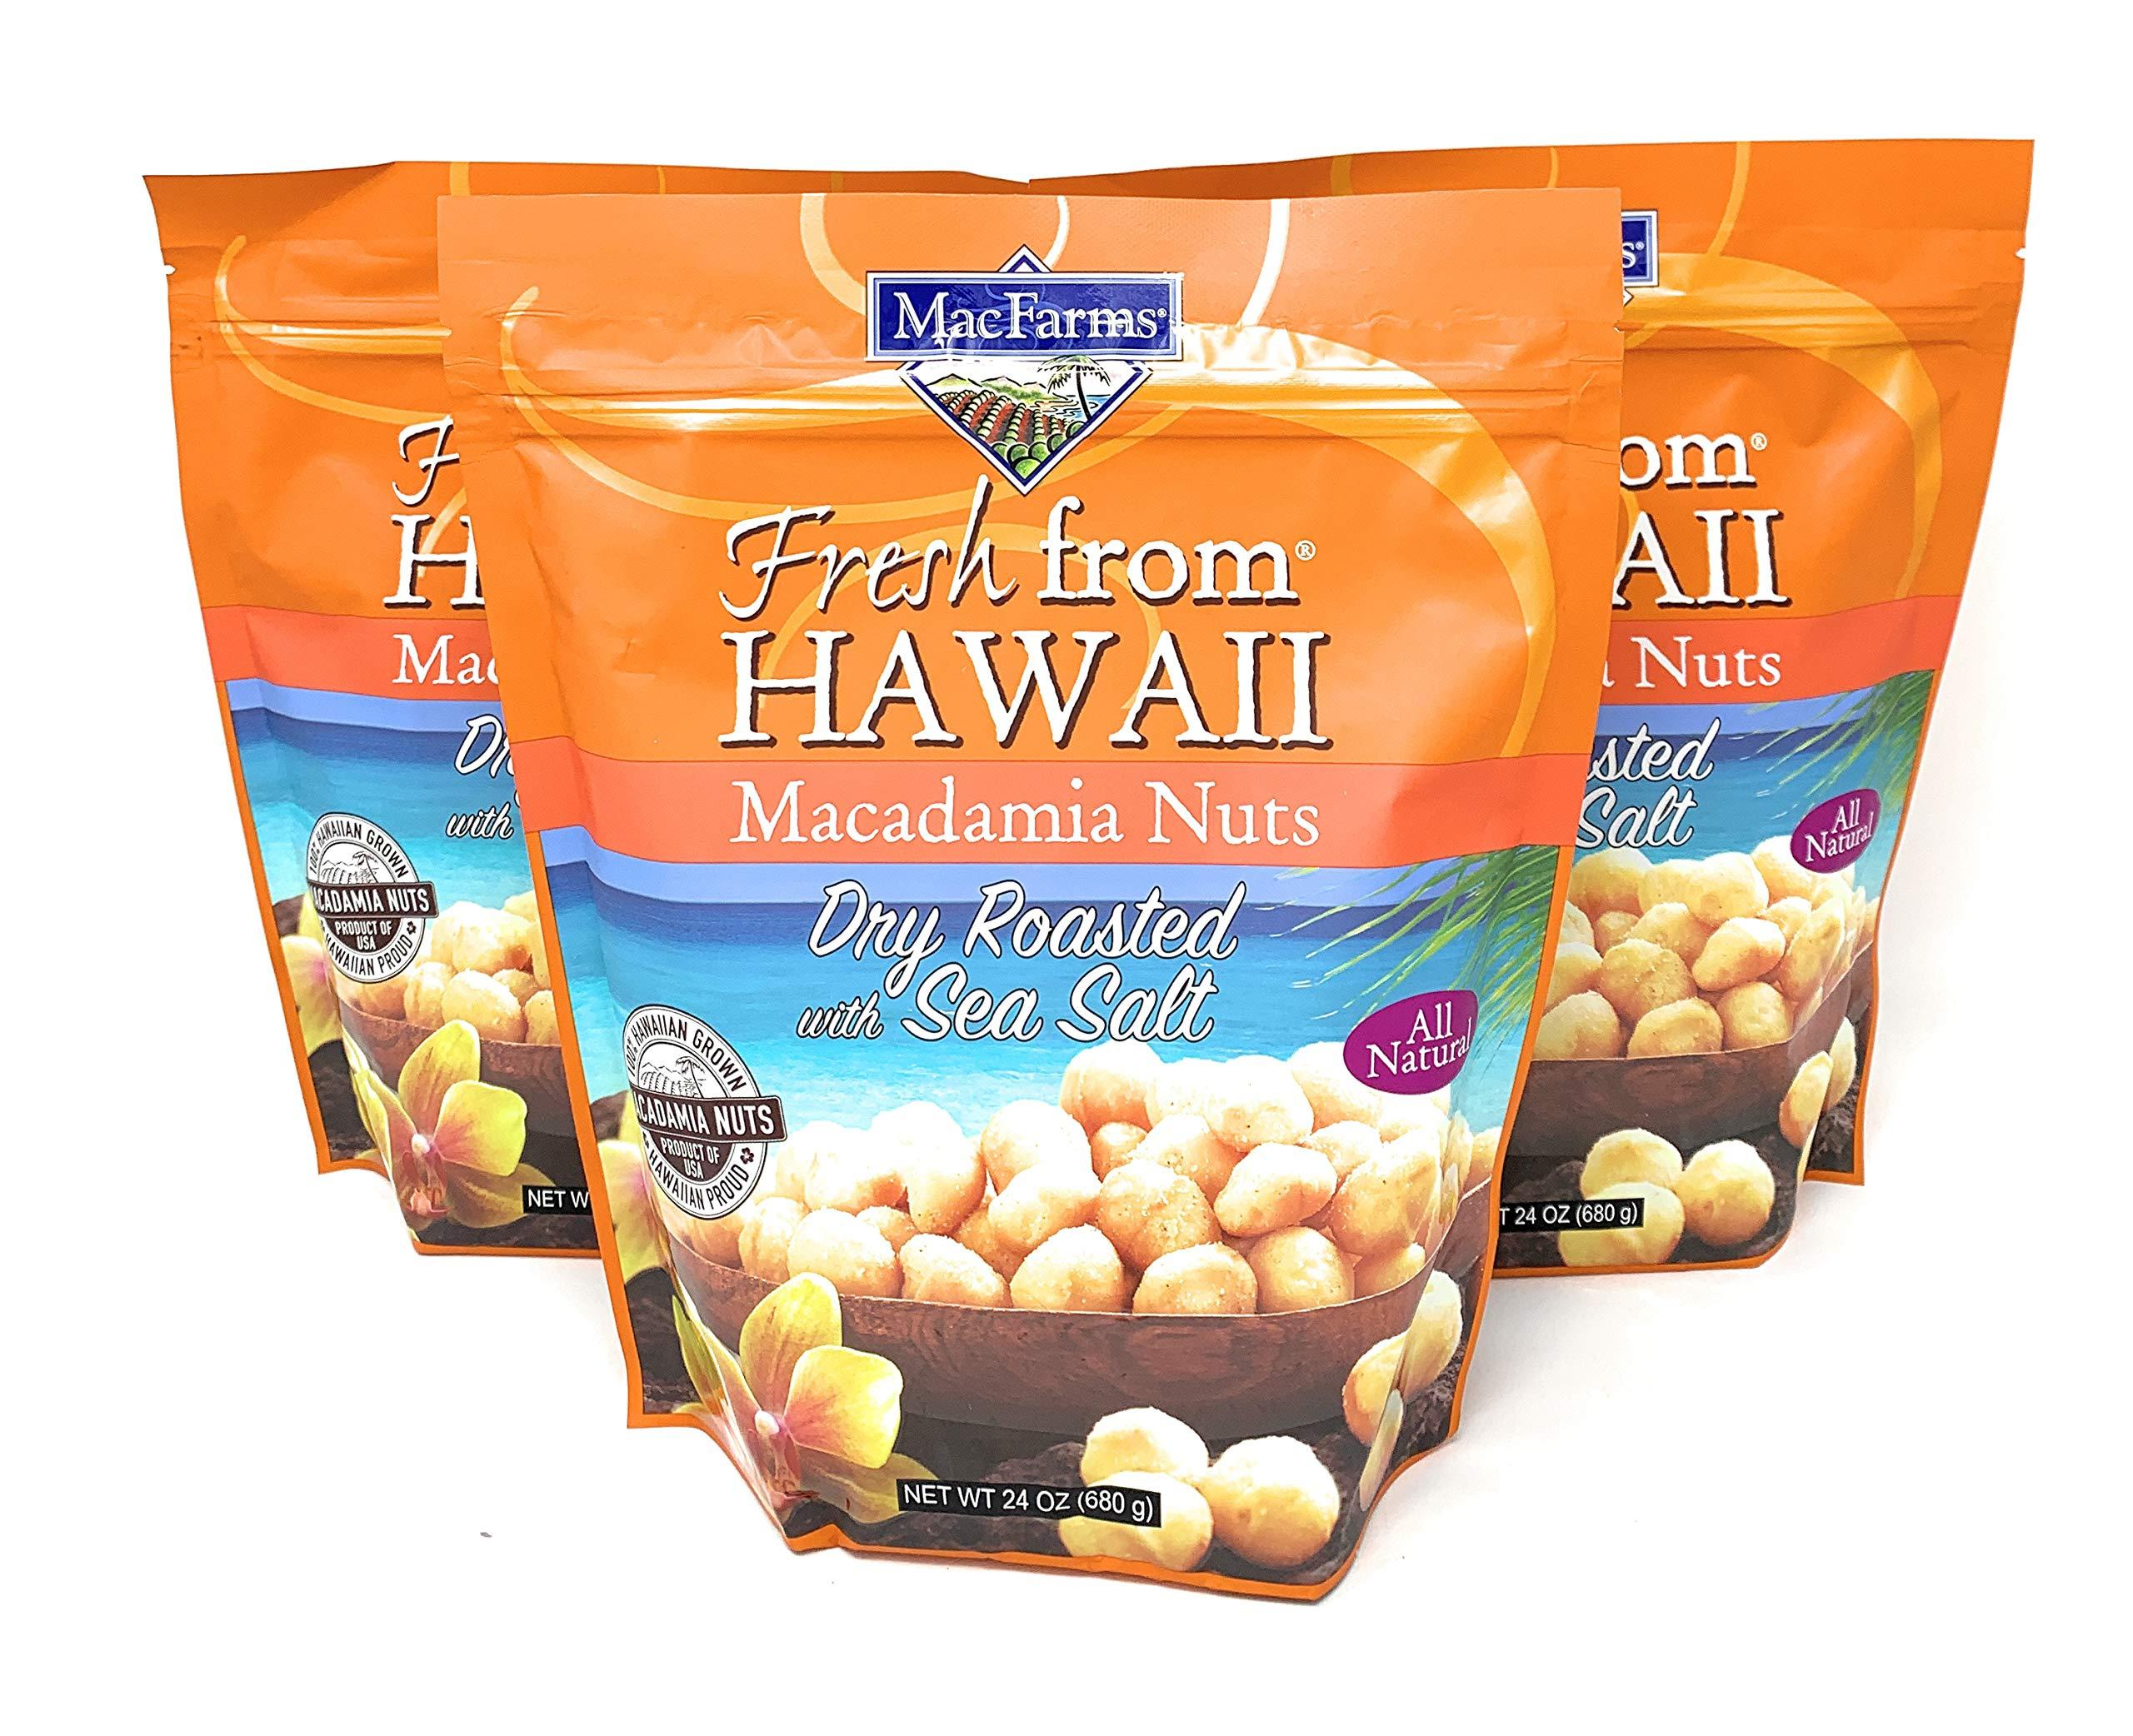 MacFarms of Hawaii Macadamia Nuts Dry Roasted with Sea Salt, 24 oz (3 Packs)